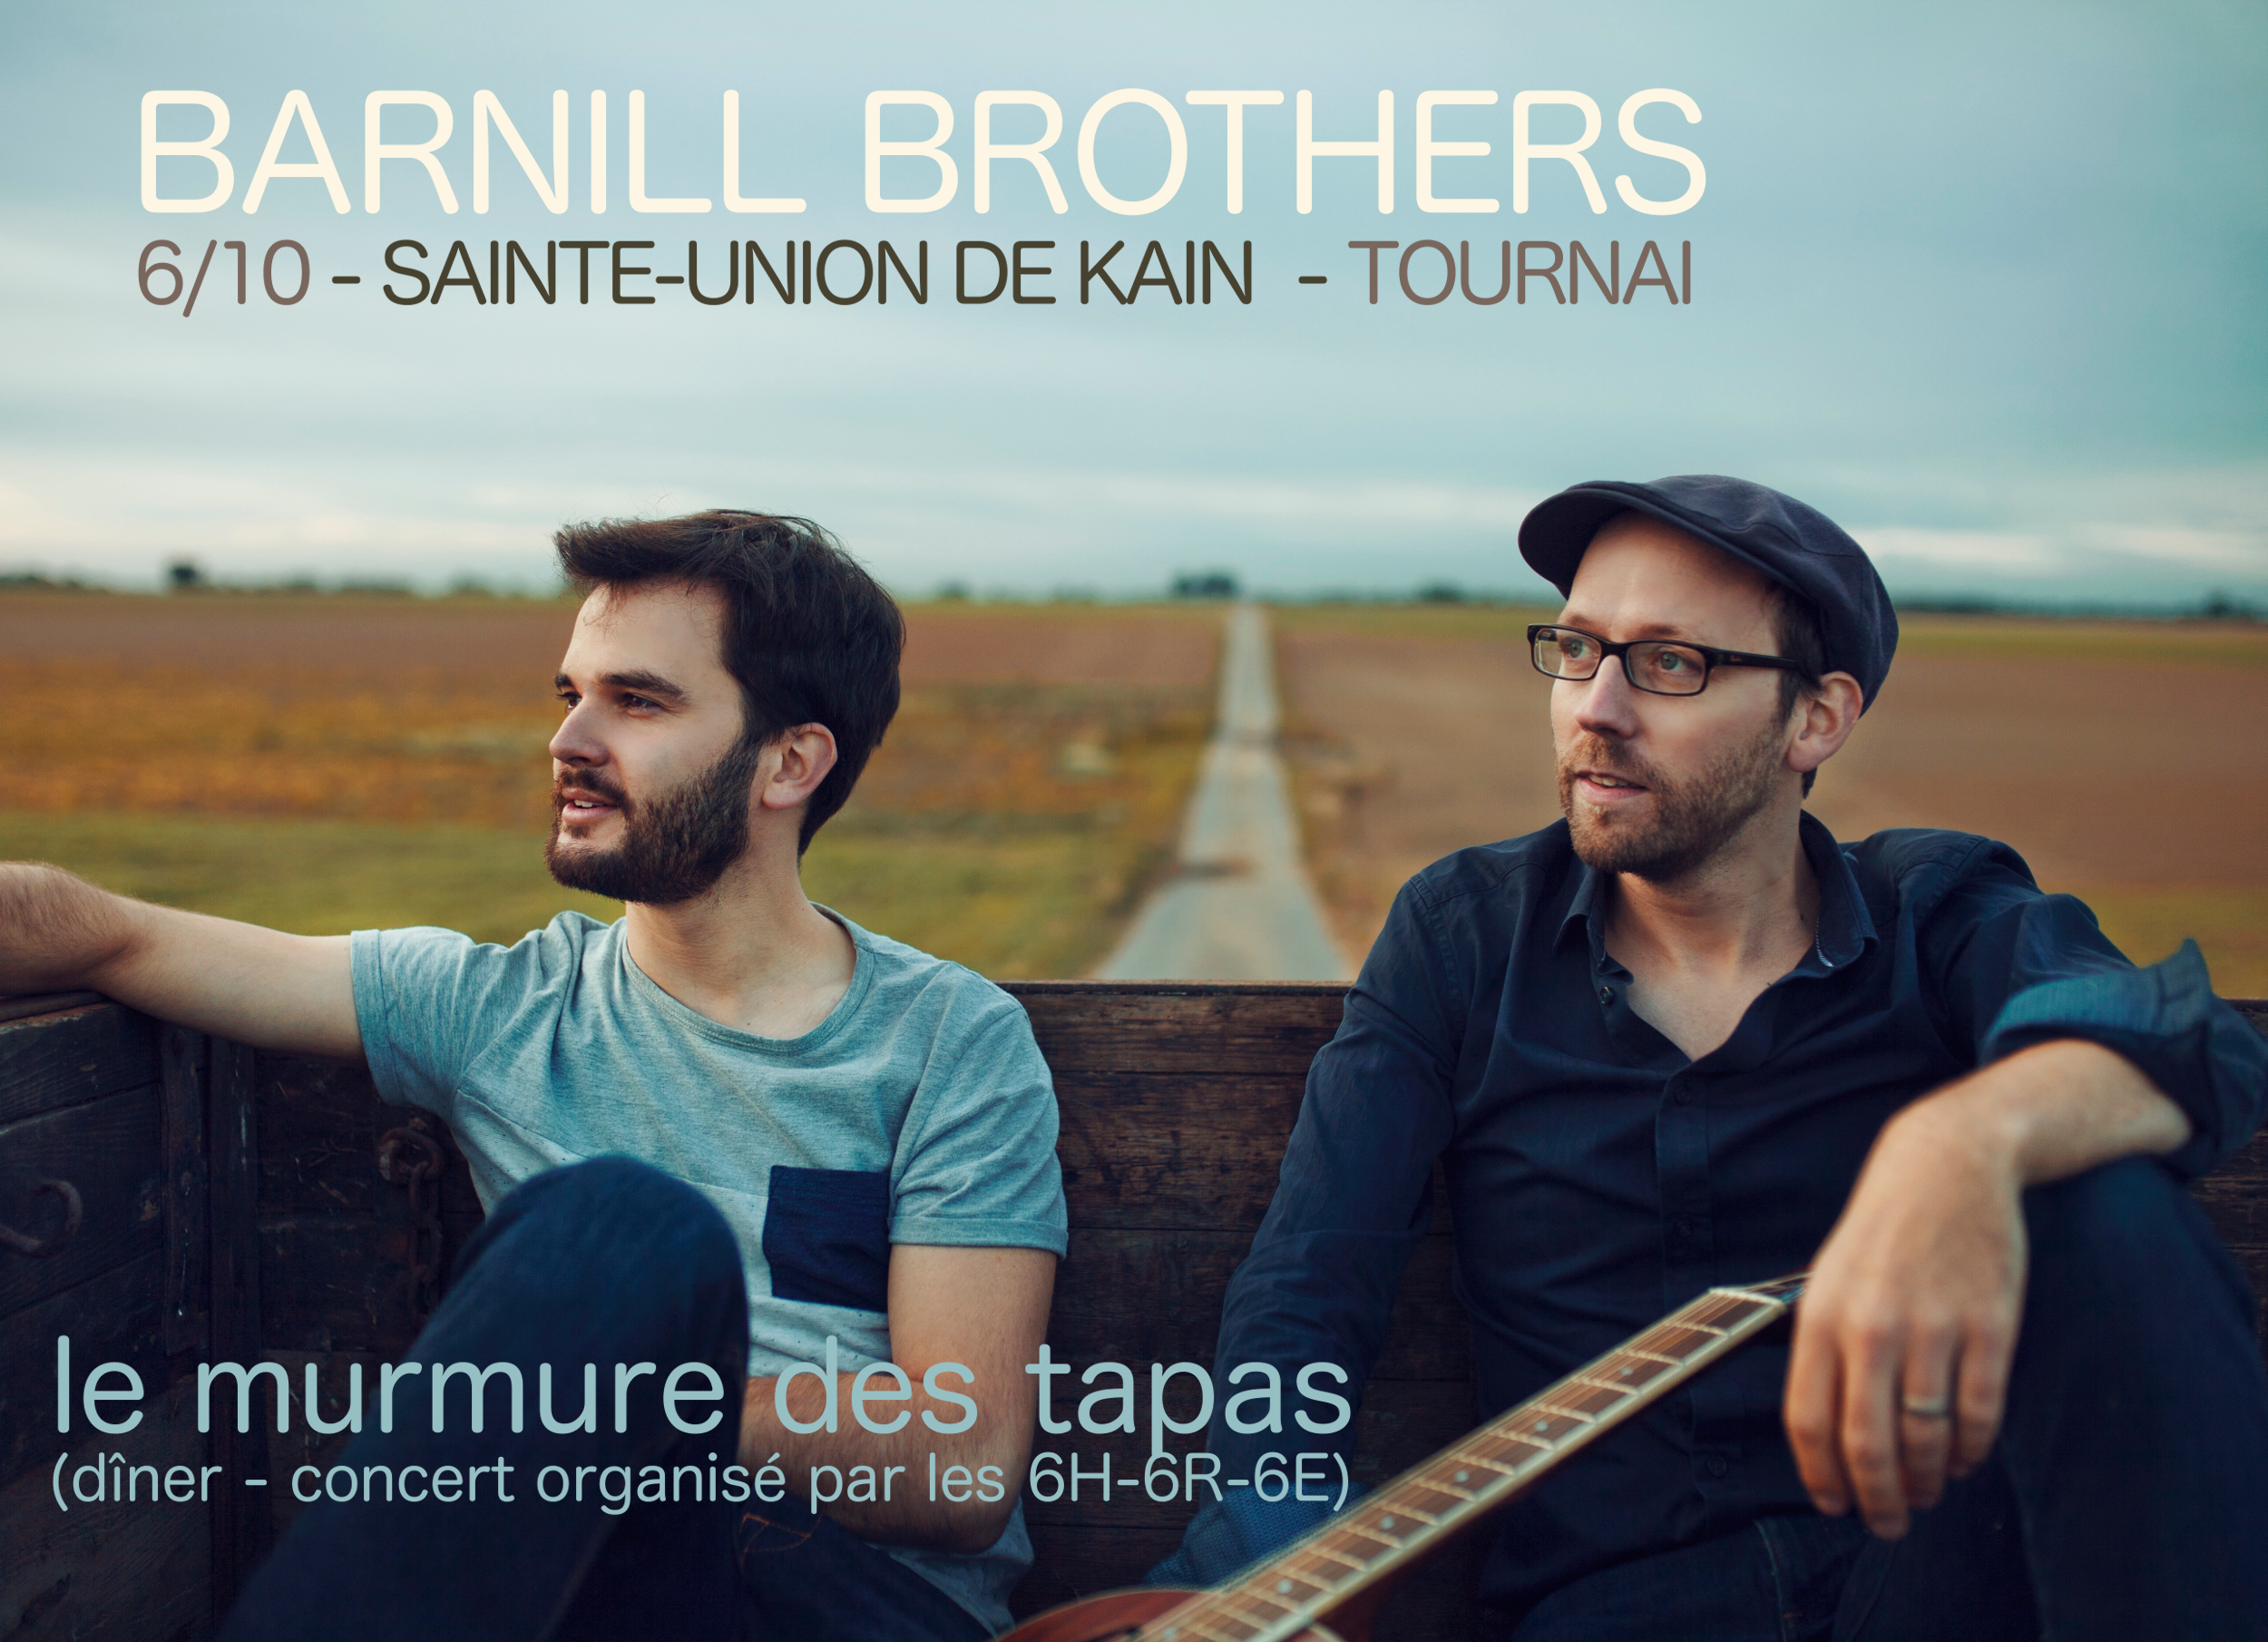 barnill-brothers-sylvain-reygaerts